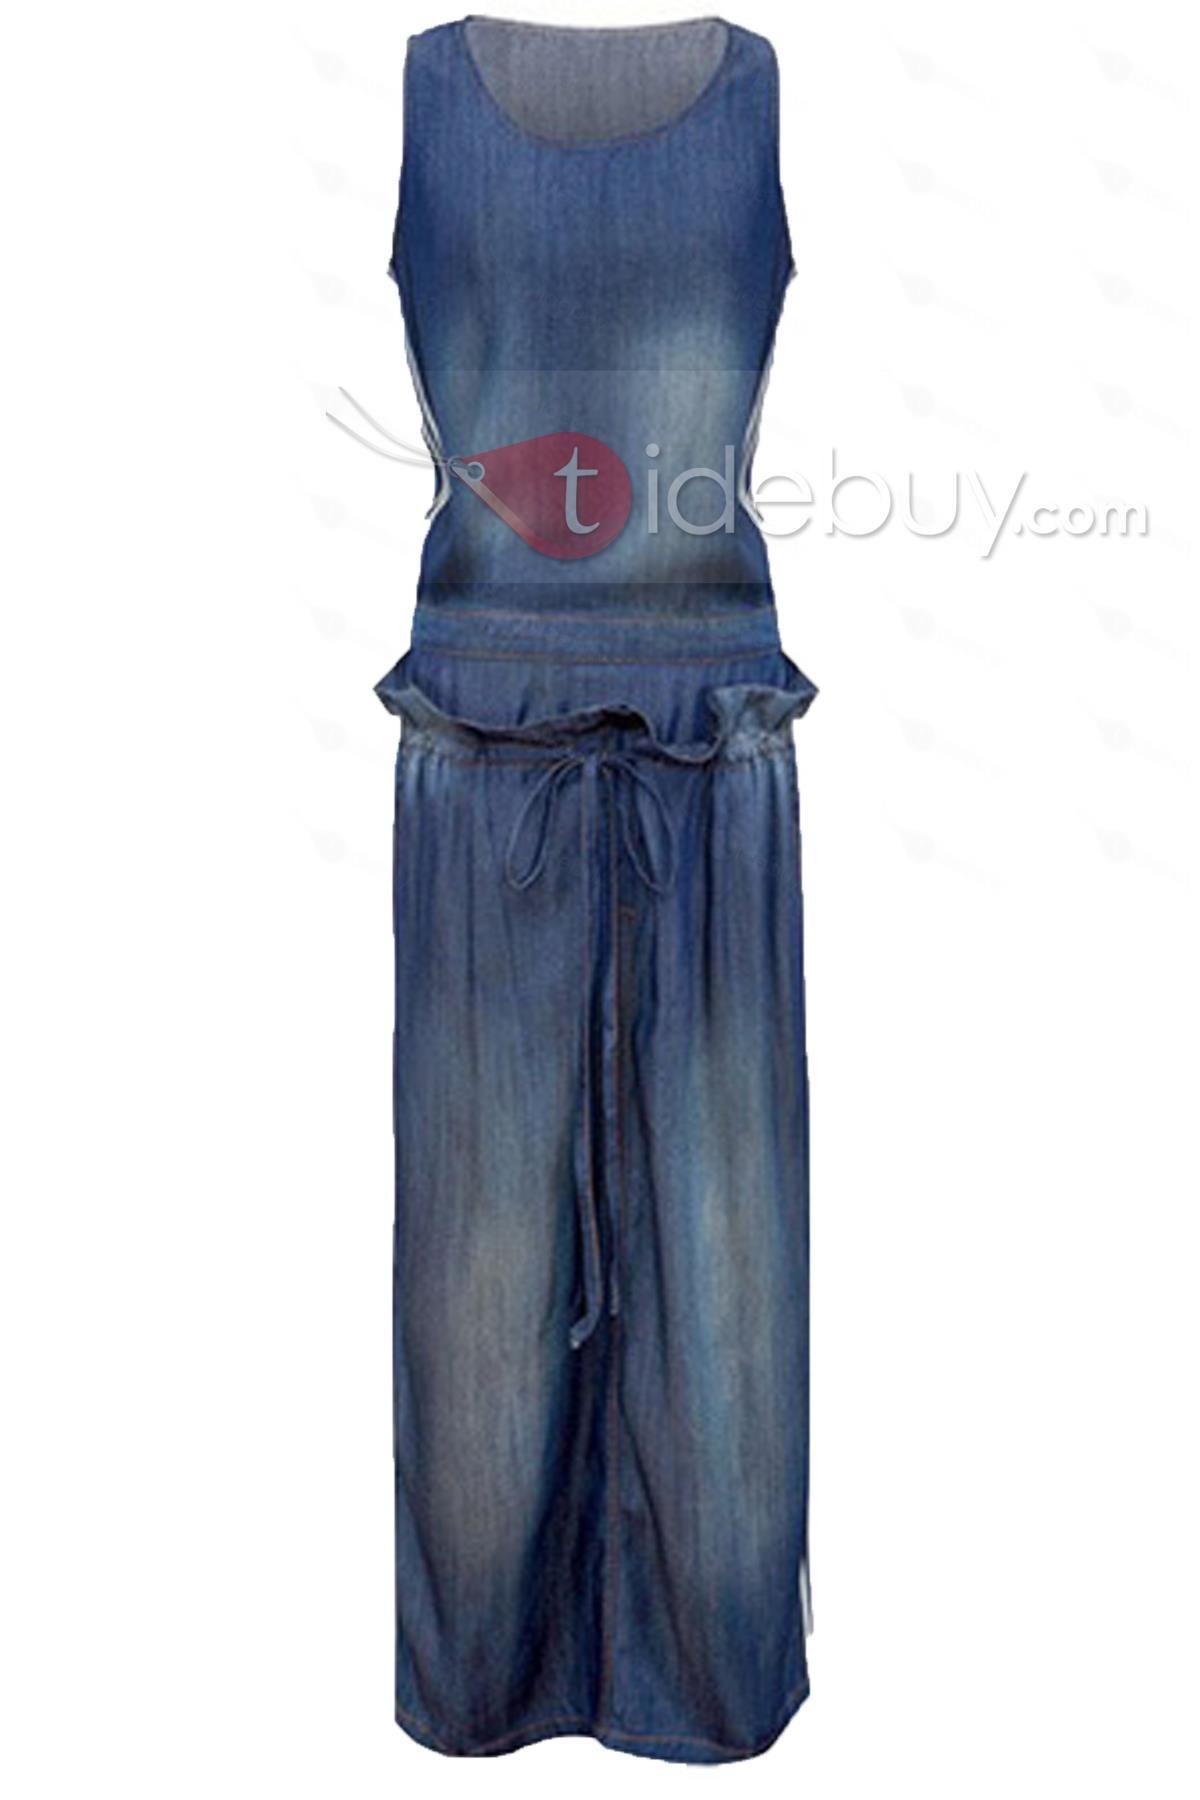 Round, Dresses , $27.99, Cool Falbala Hem Round Neckline Sleeveless Long Denim Dress